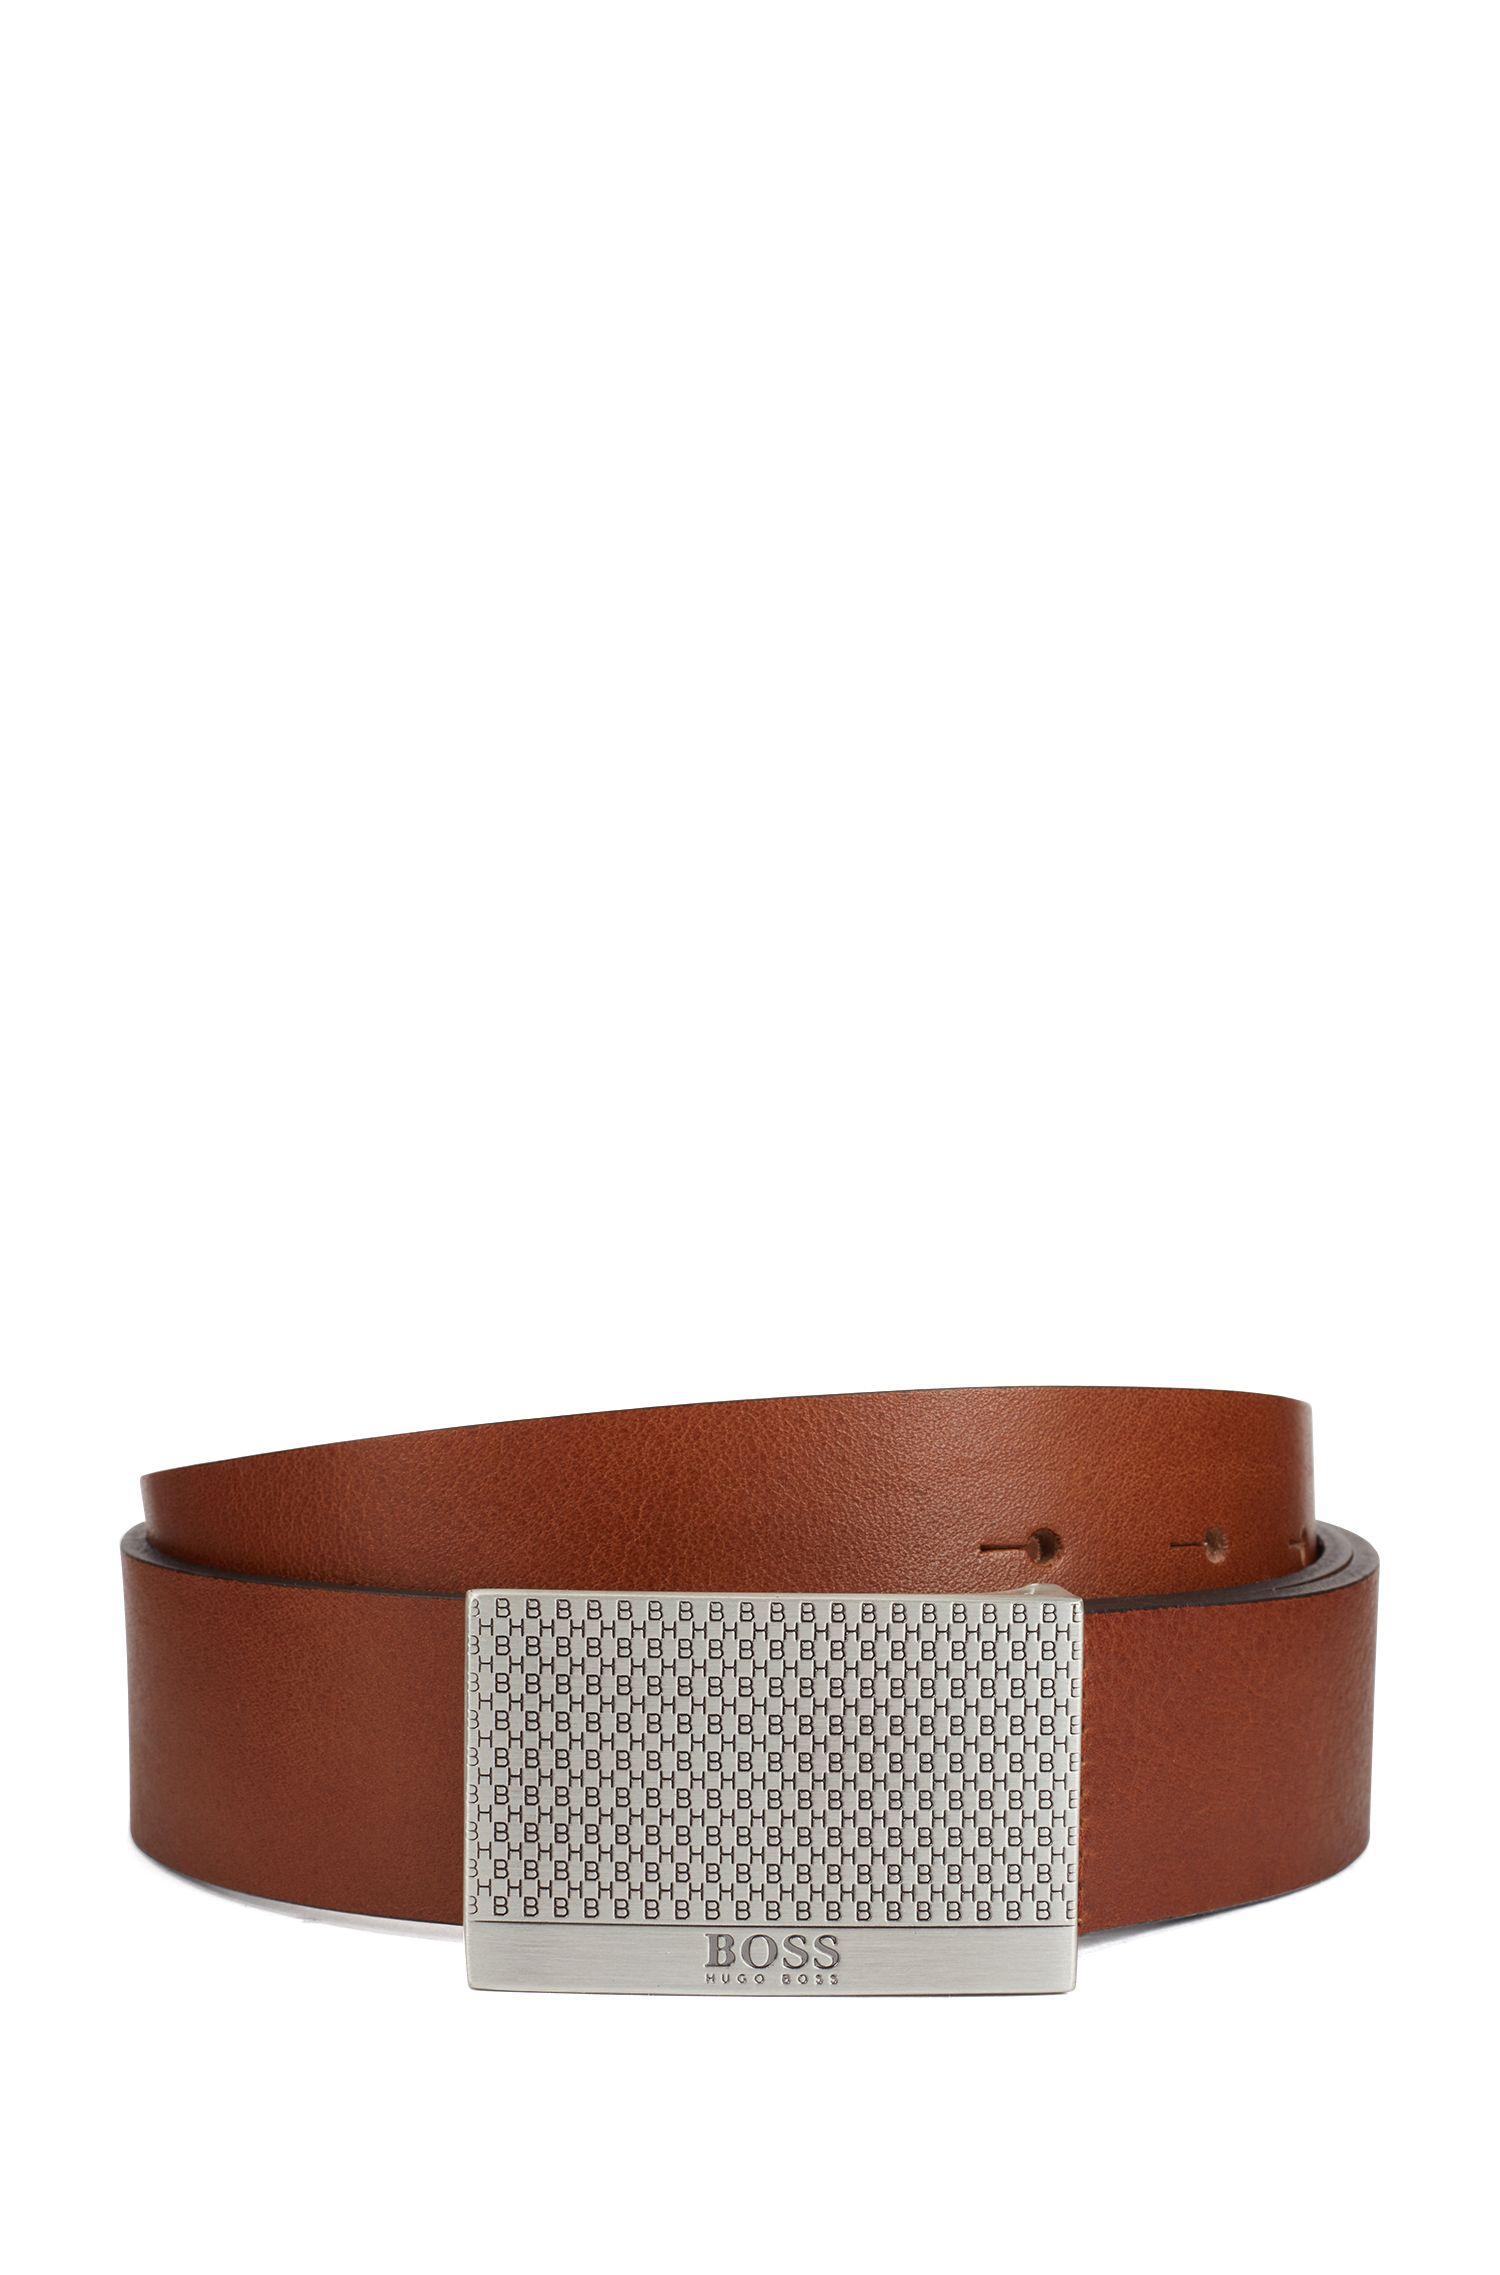 Hugo Boss - Ledergürtel mit Koppelschließe im Monogramm-Design - 1